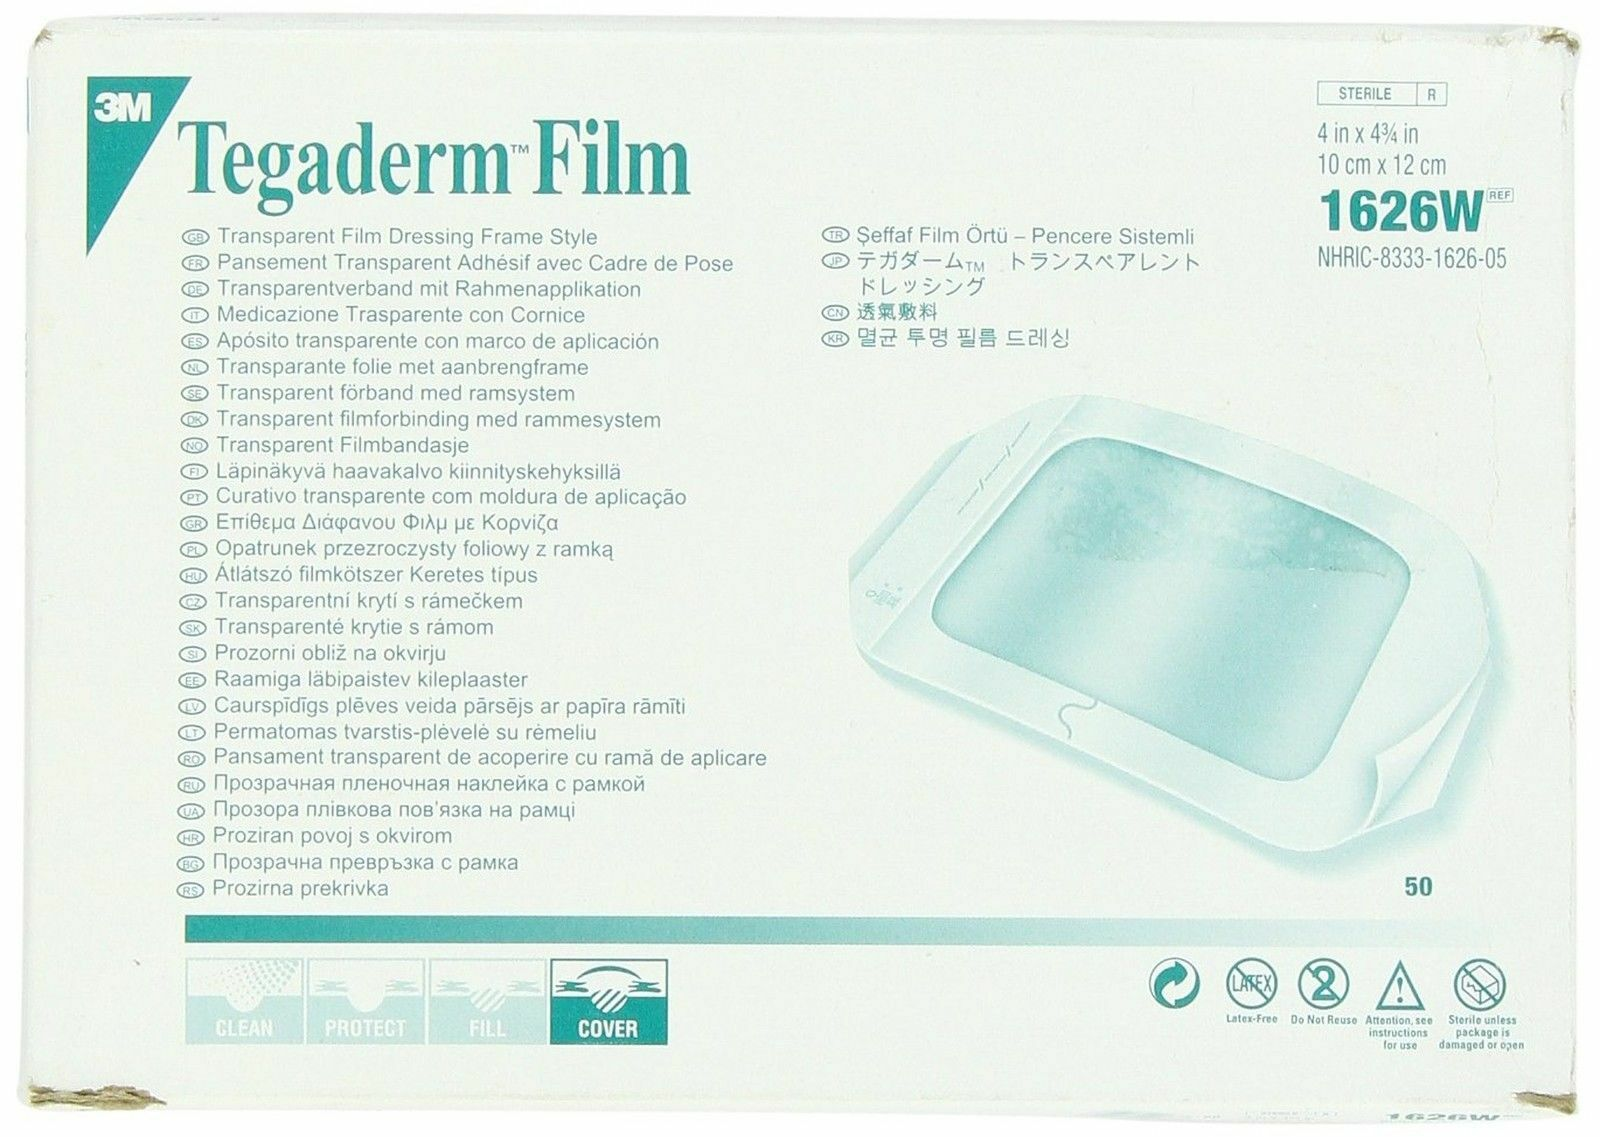 3m Tegaderm Transparent Dressing With Label 4 X 4 34 10 X 12 Cm